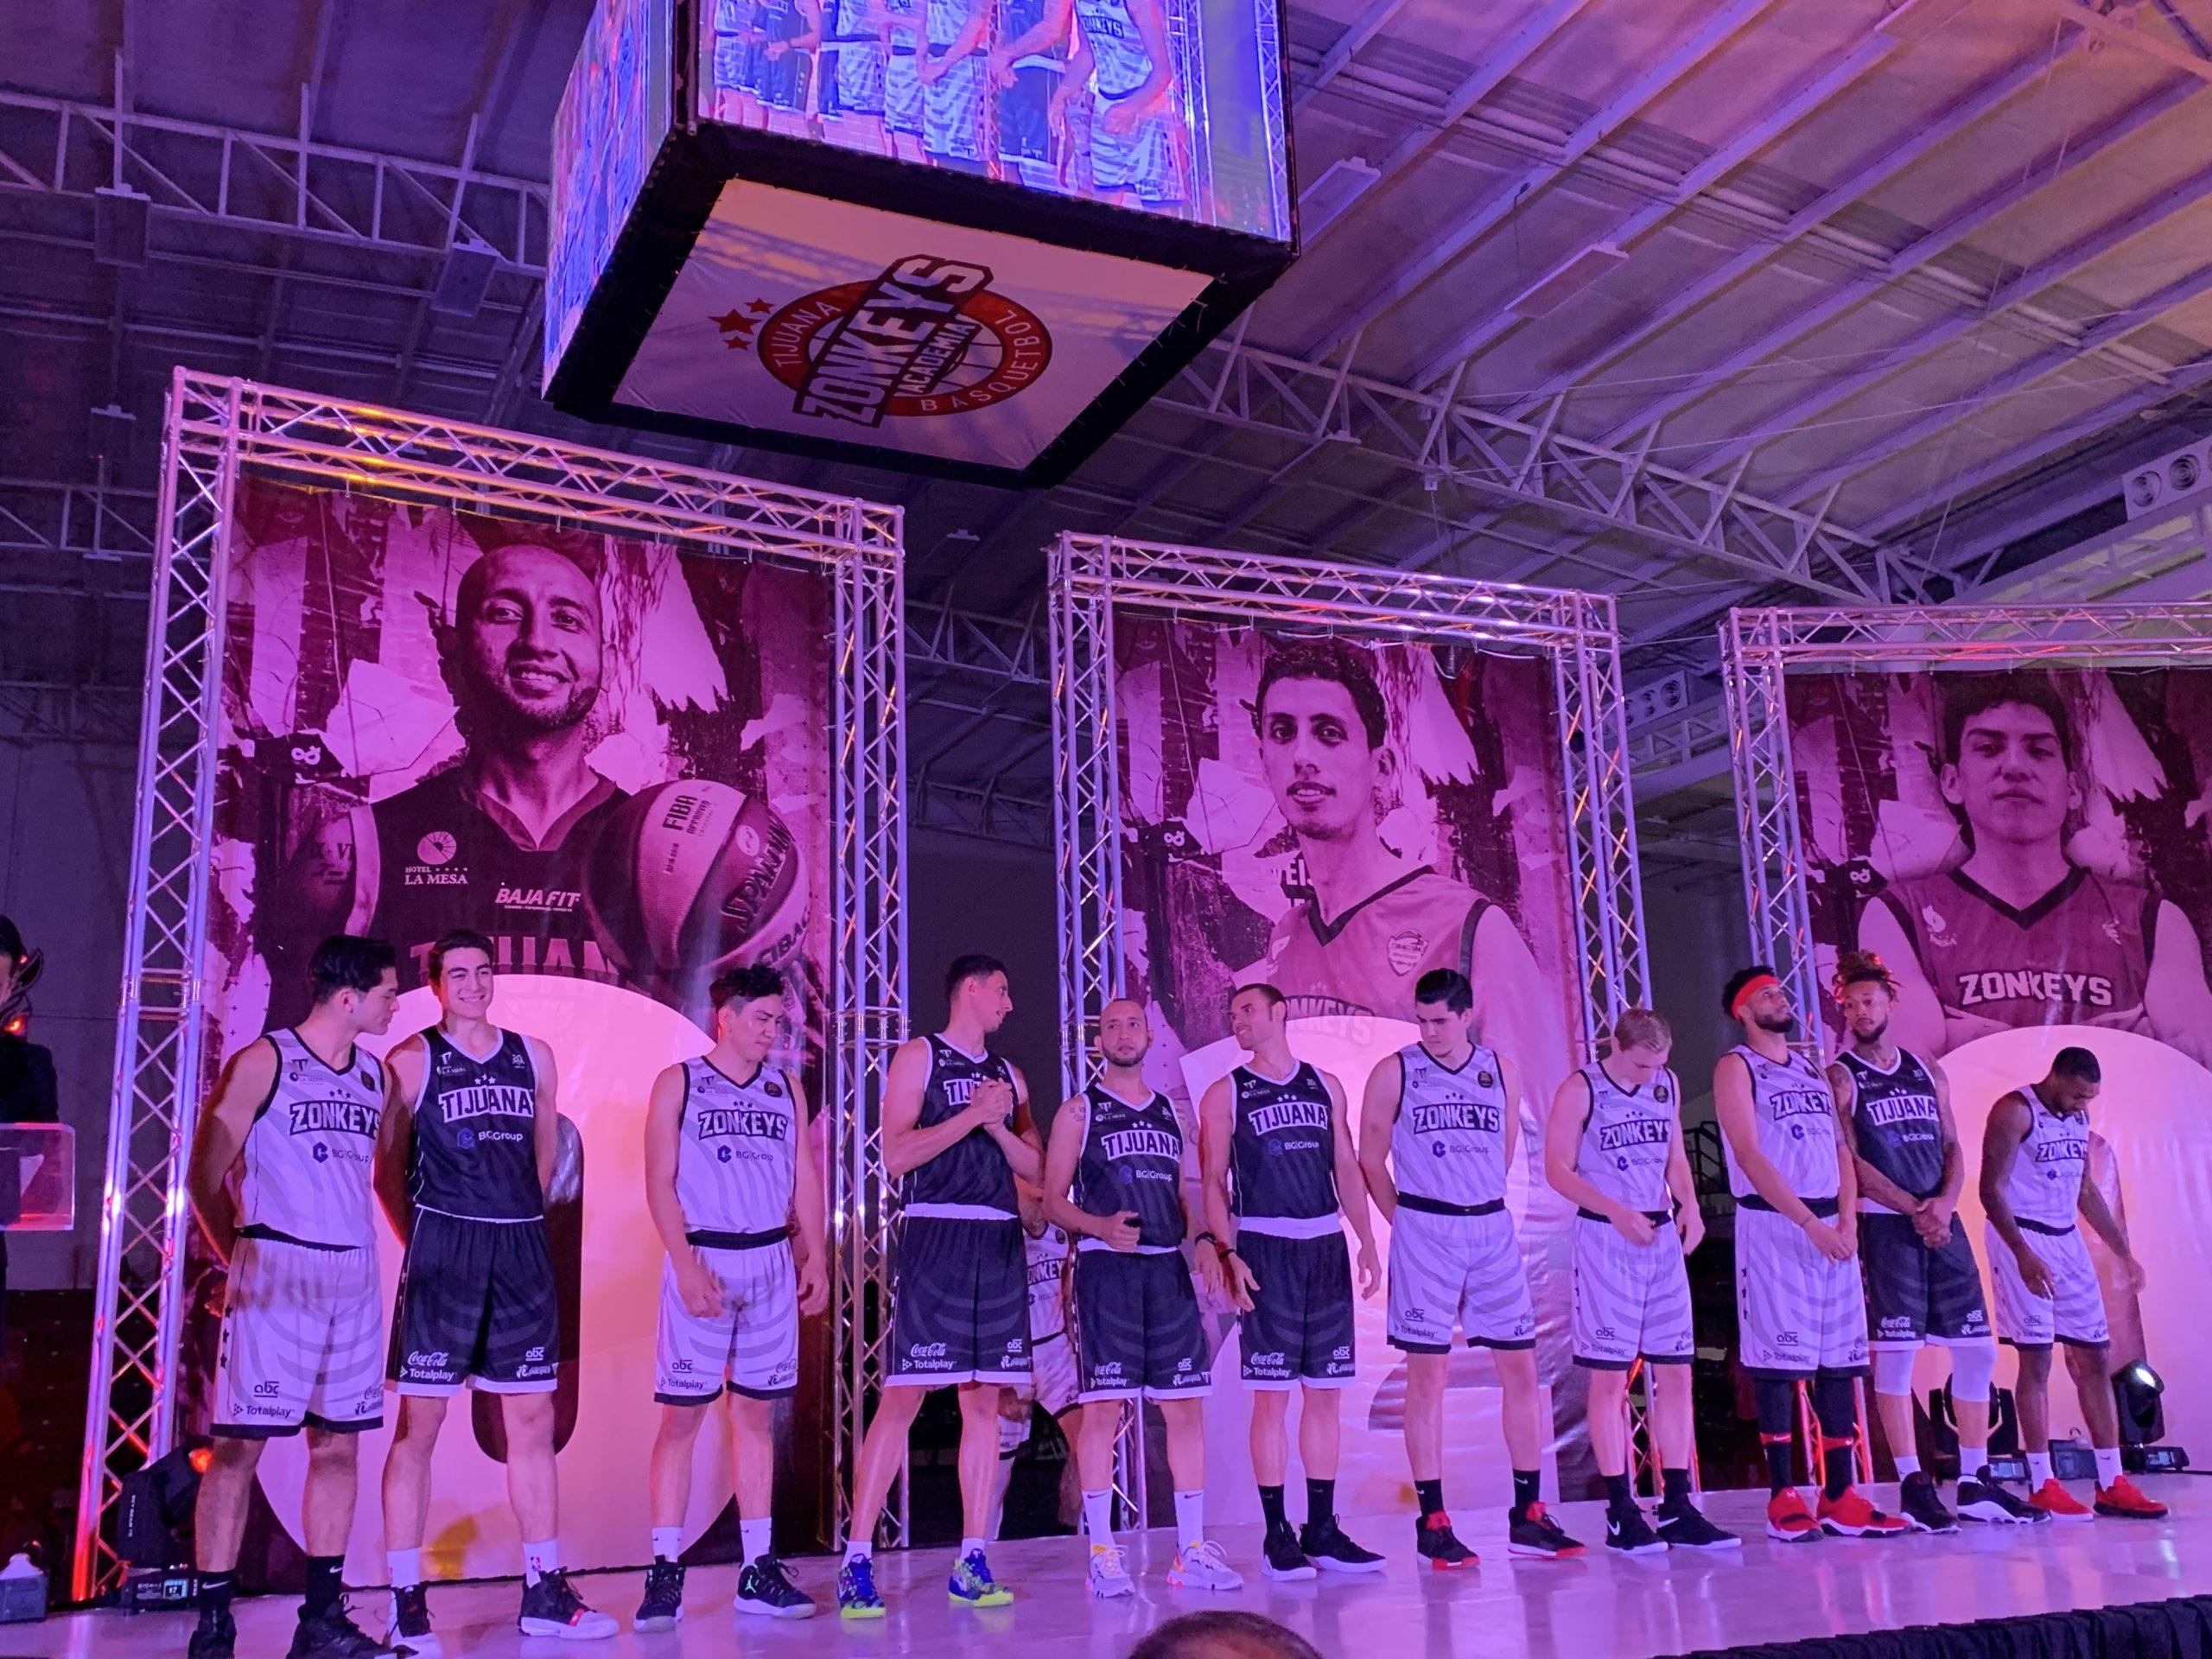 equipo basquetbol Zonkeys